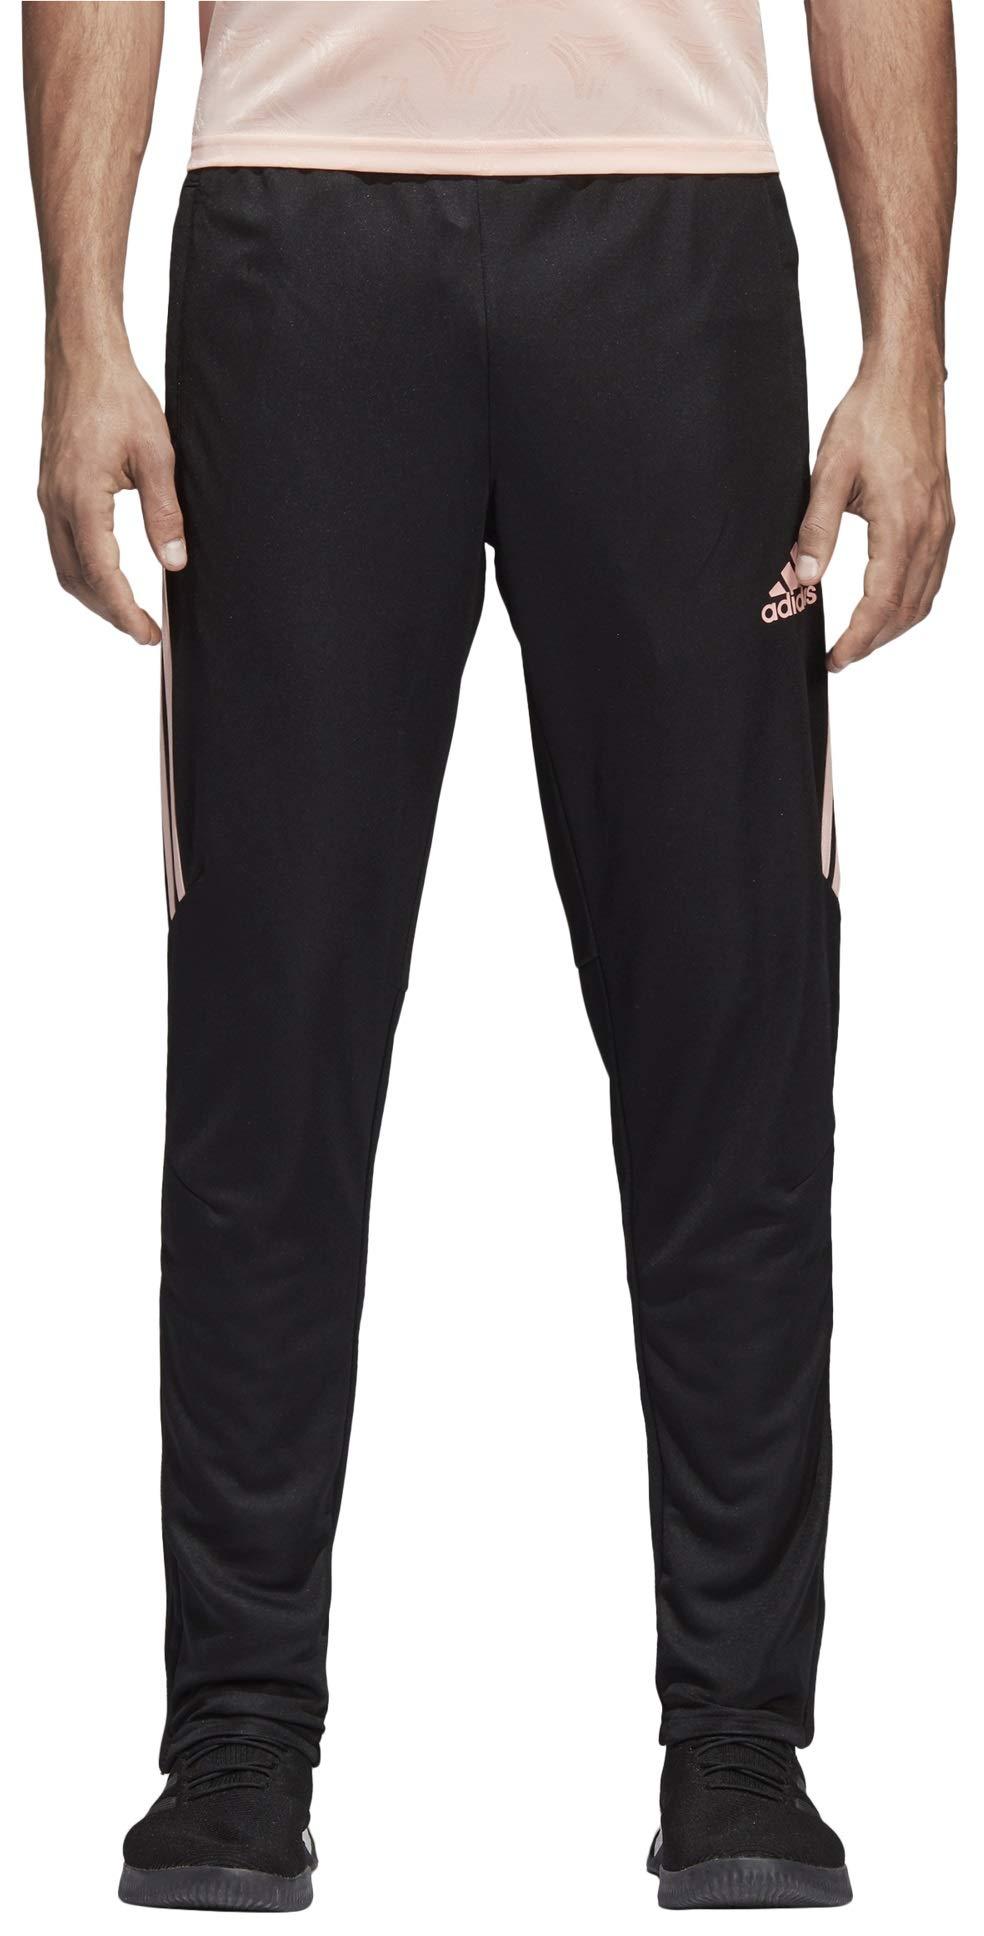 adidas Men's Soccer Tiro 17 Training Pant, Black/Haze Coral, Medium